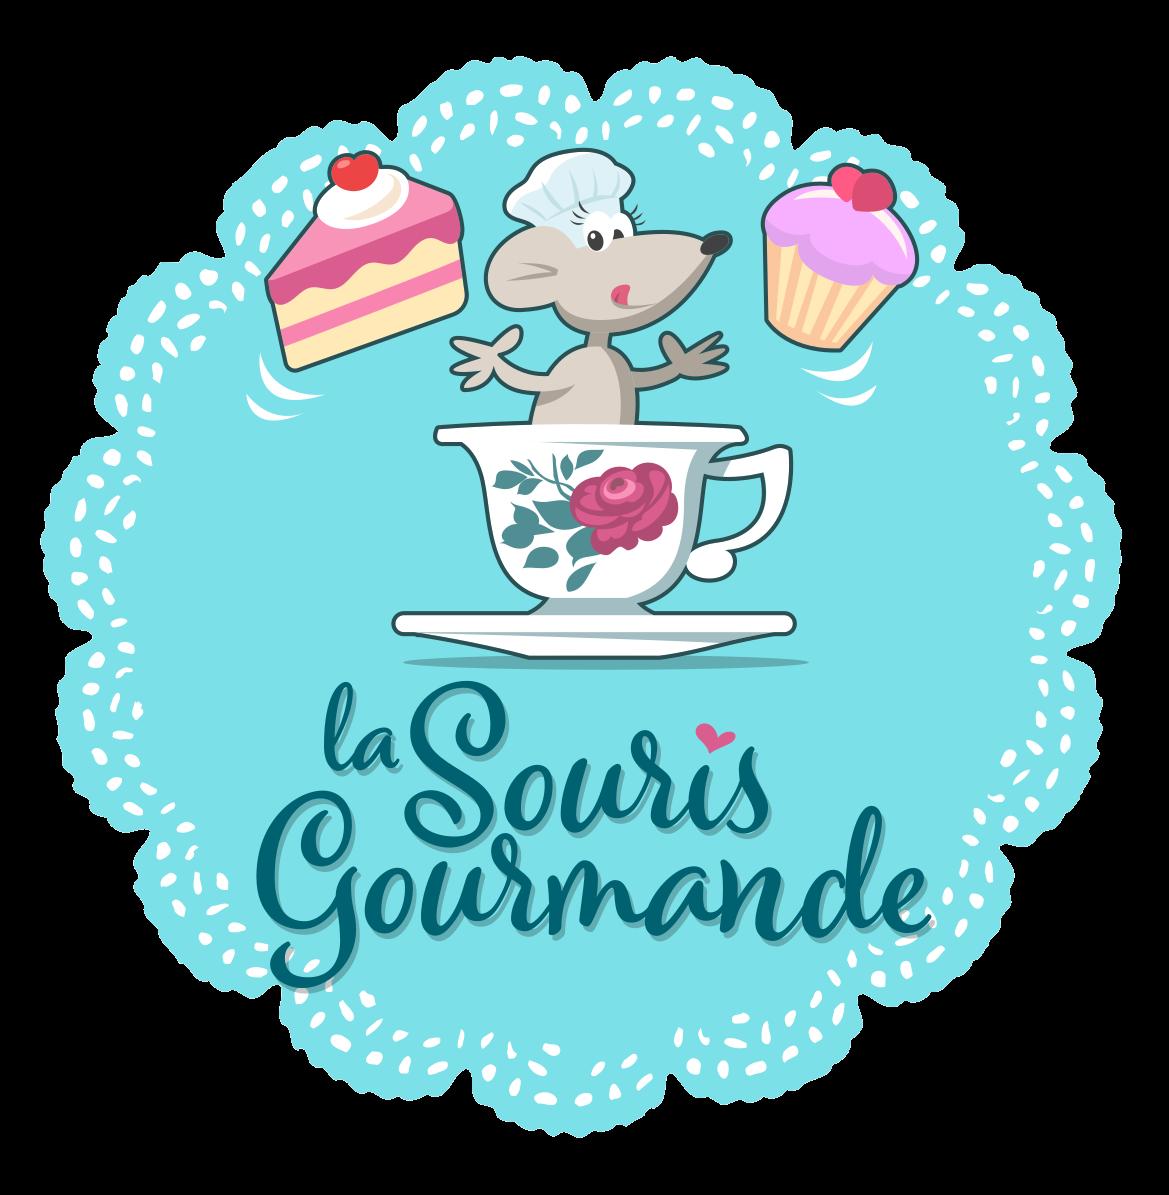 logo La Souris gourmande Gray